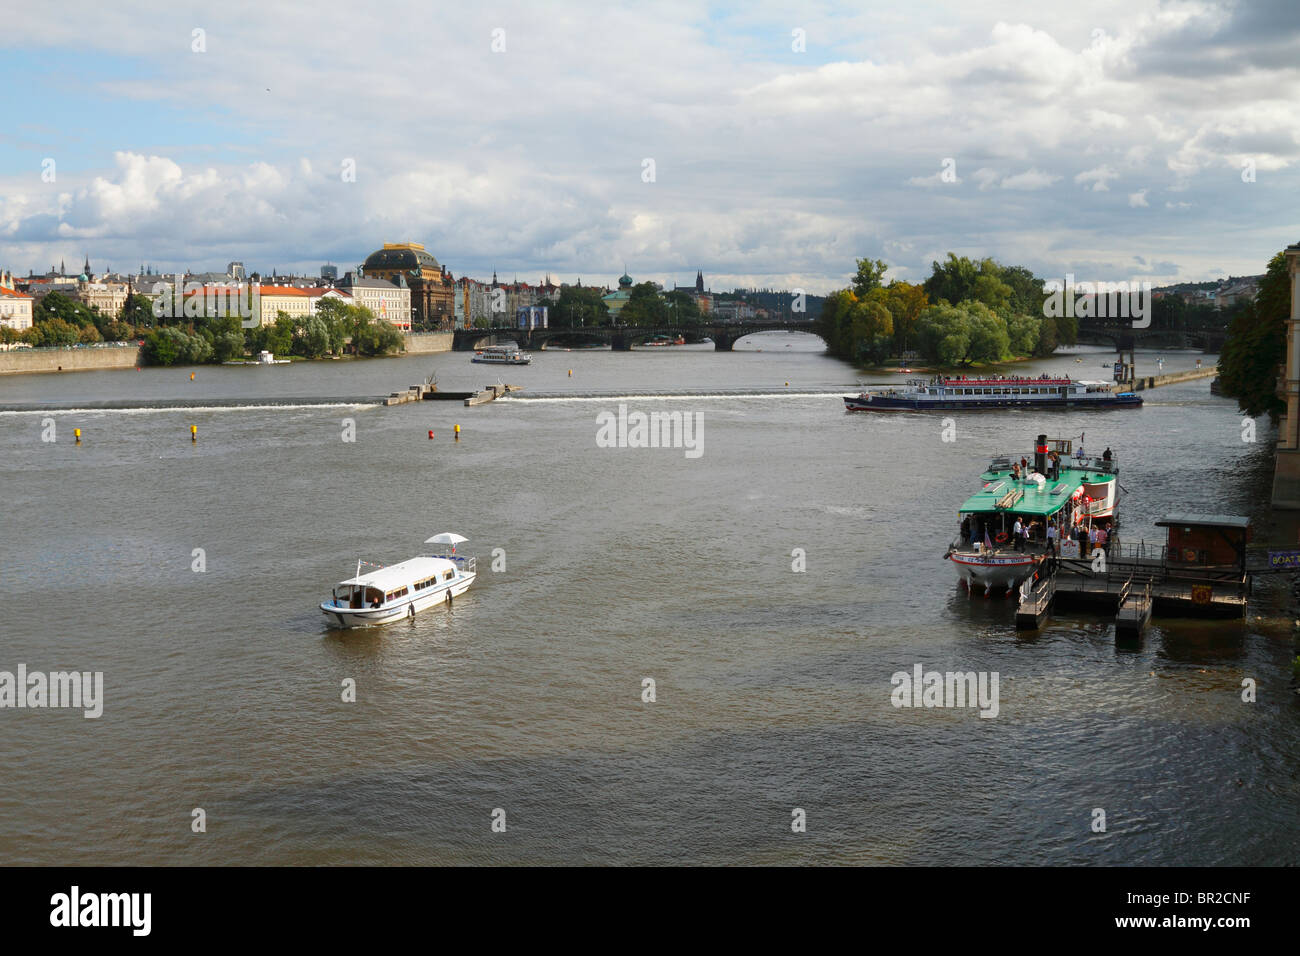 Wharfed (laddered) boat at Vltava river, Prague, Czech Republic August 2010 - Stock Image